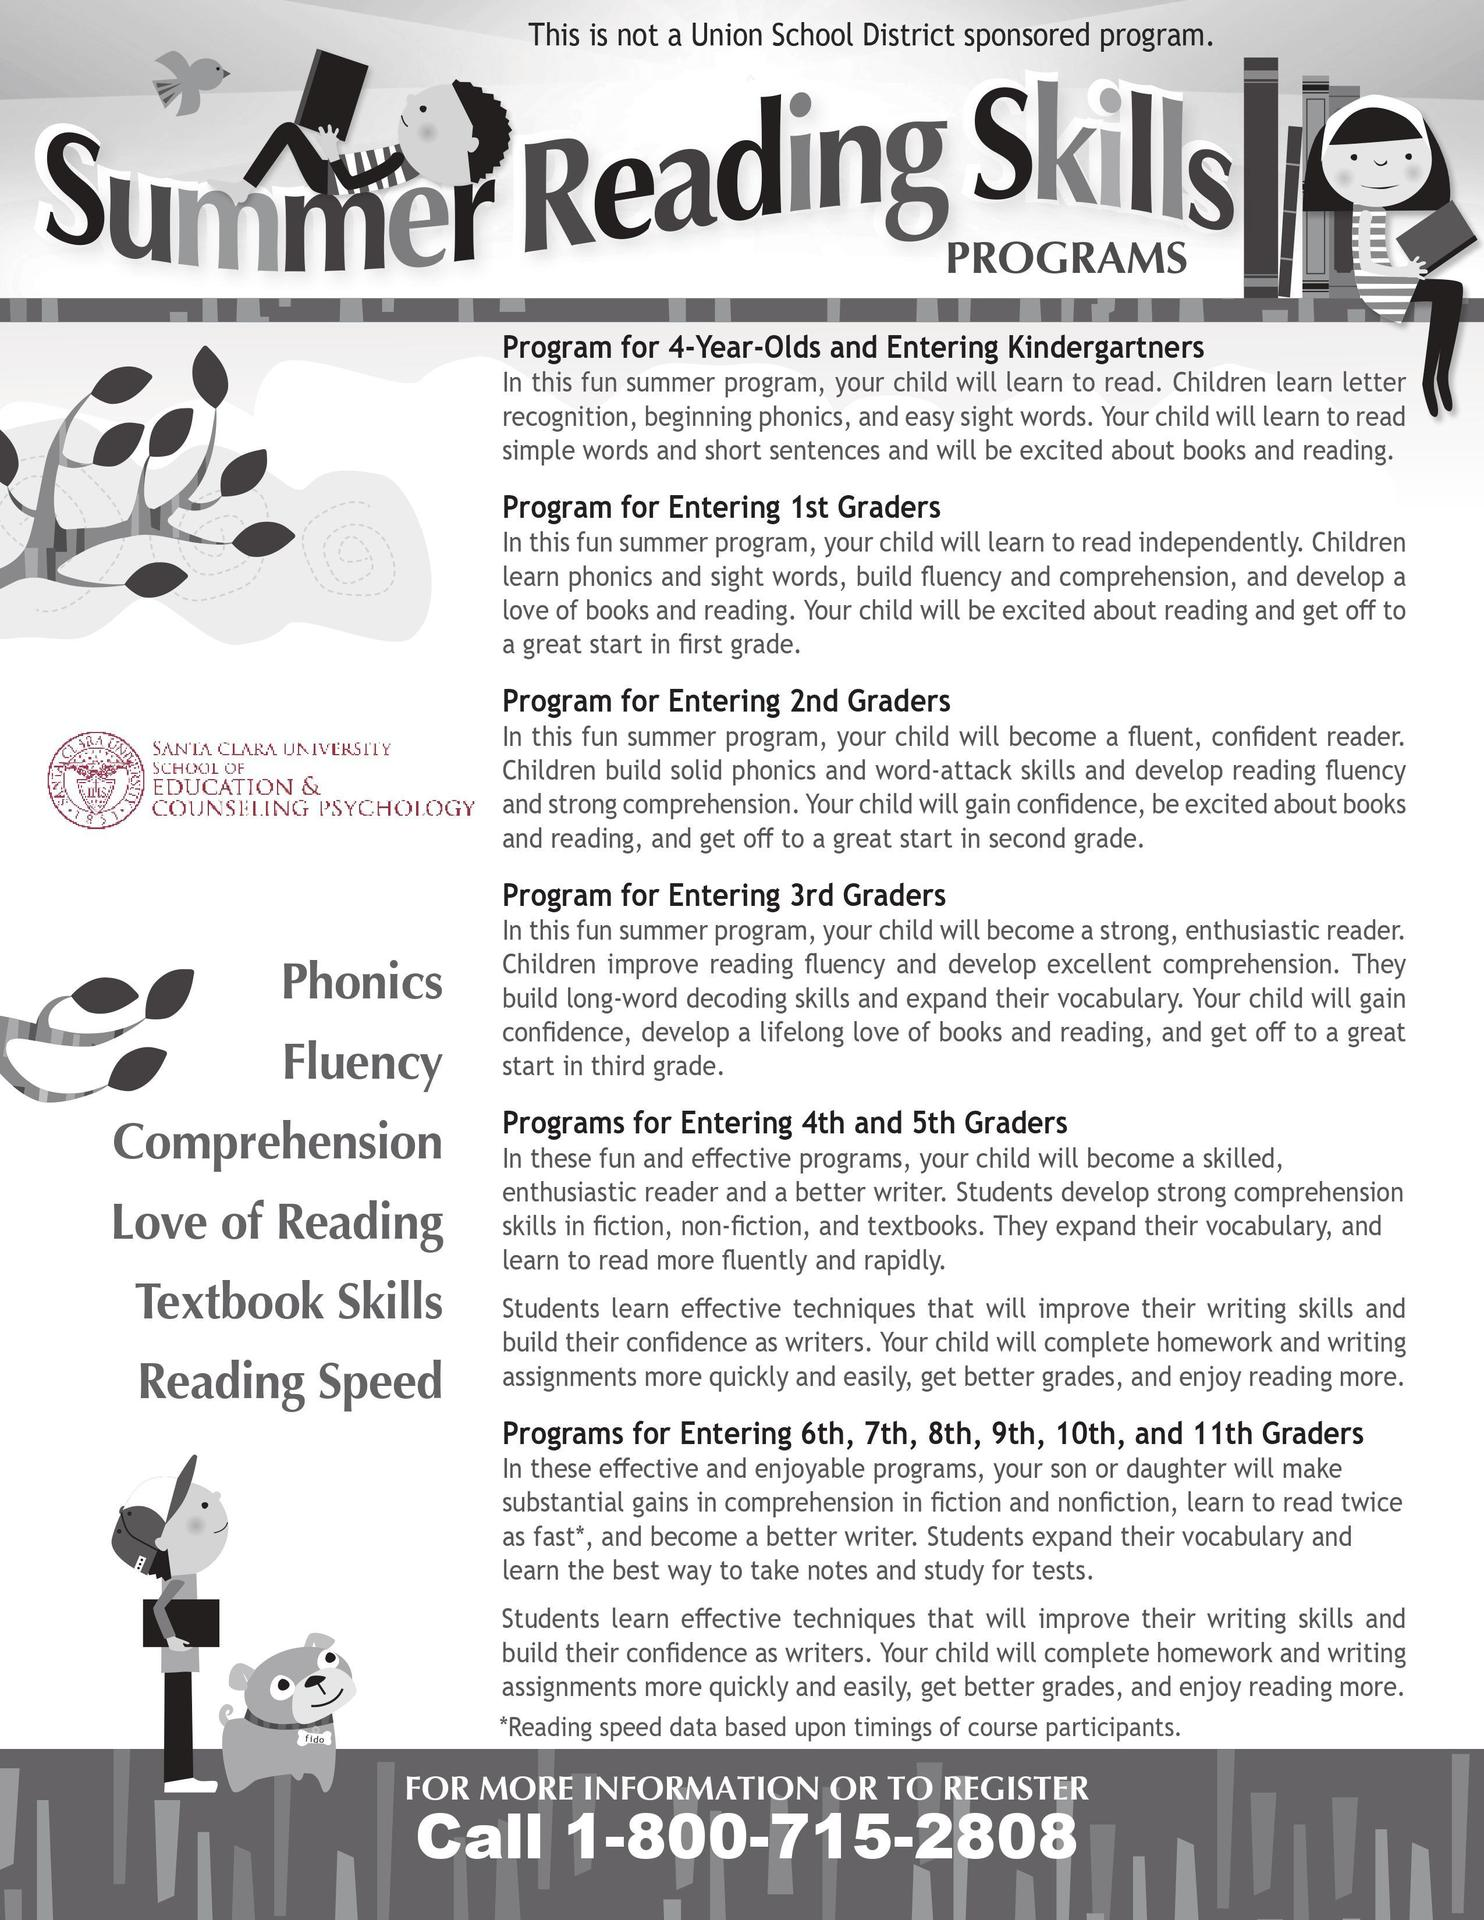 Santa Clara University Summer Reading Enrichment Program